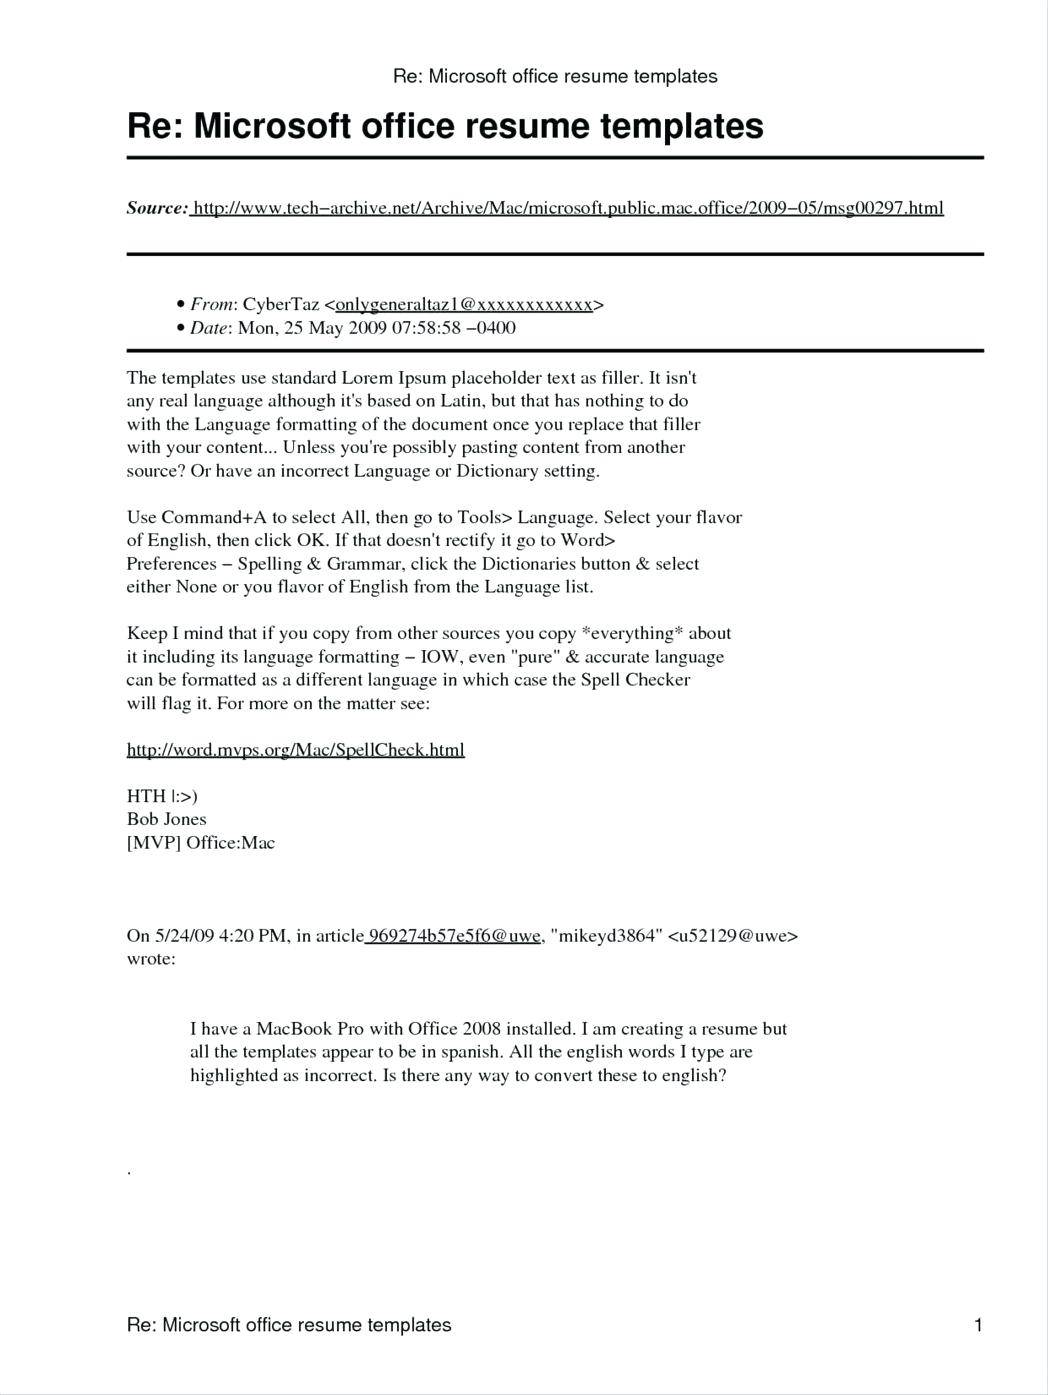 Microsoft Office Access 2003 Templates